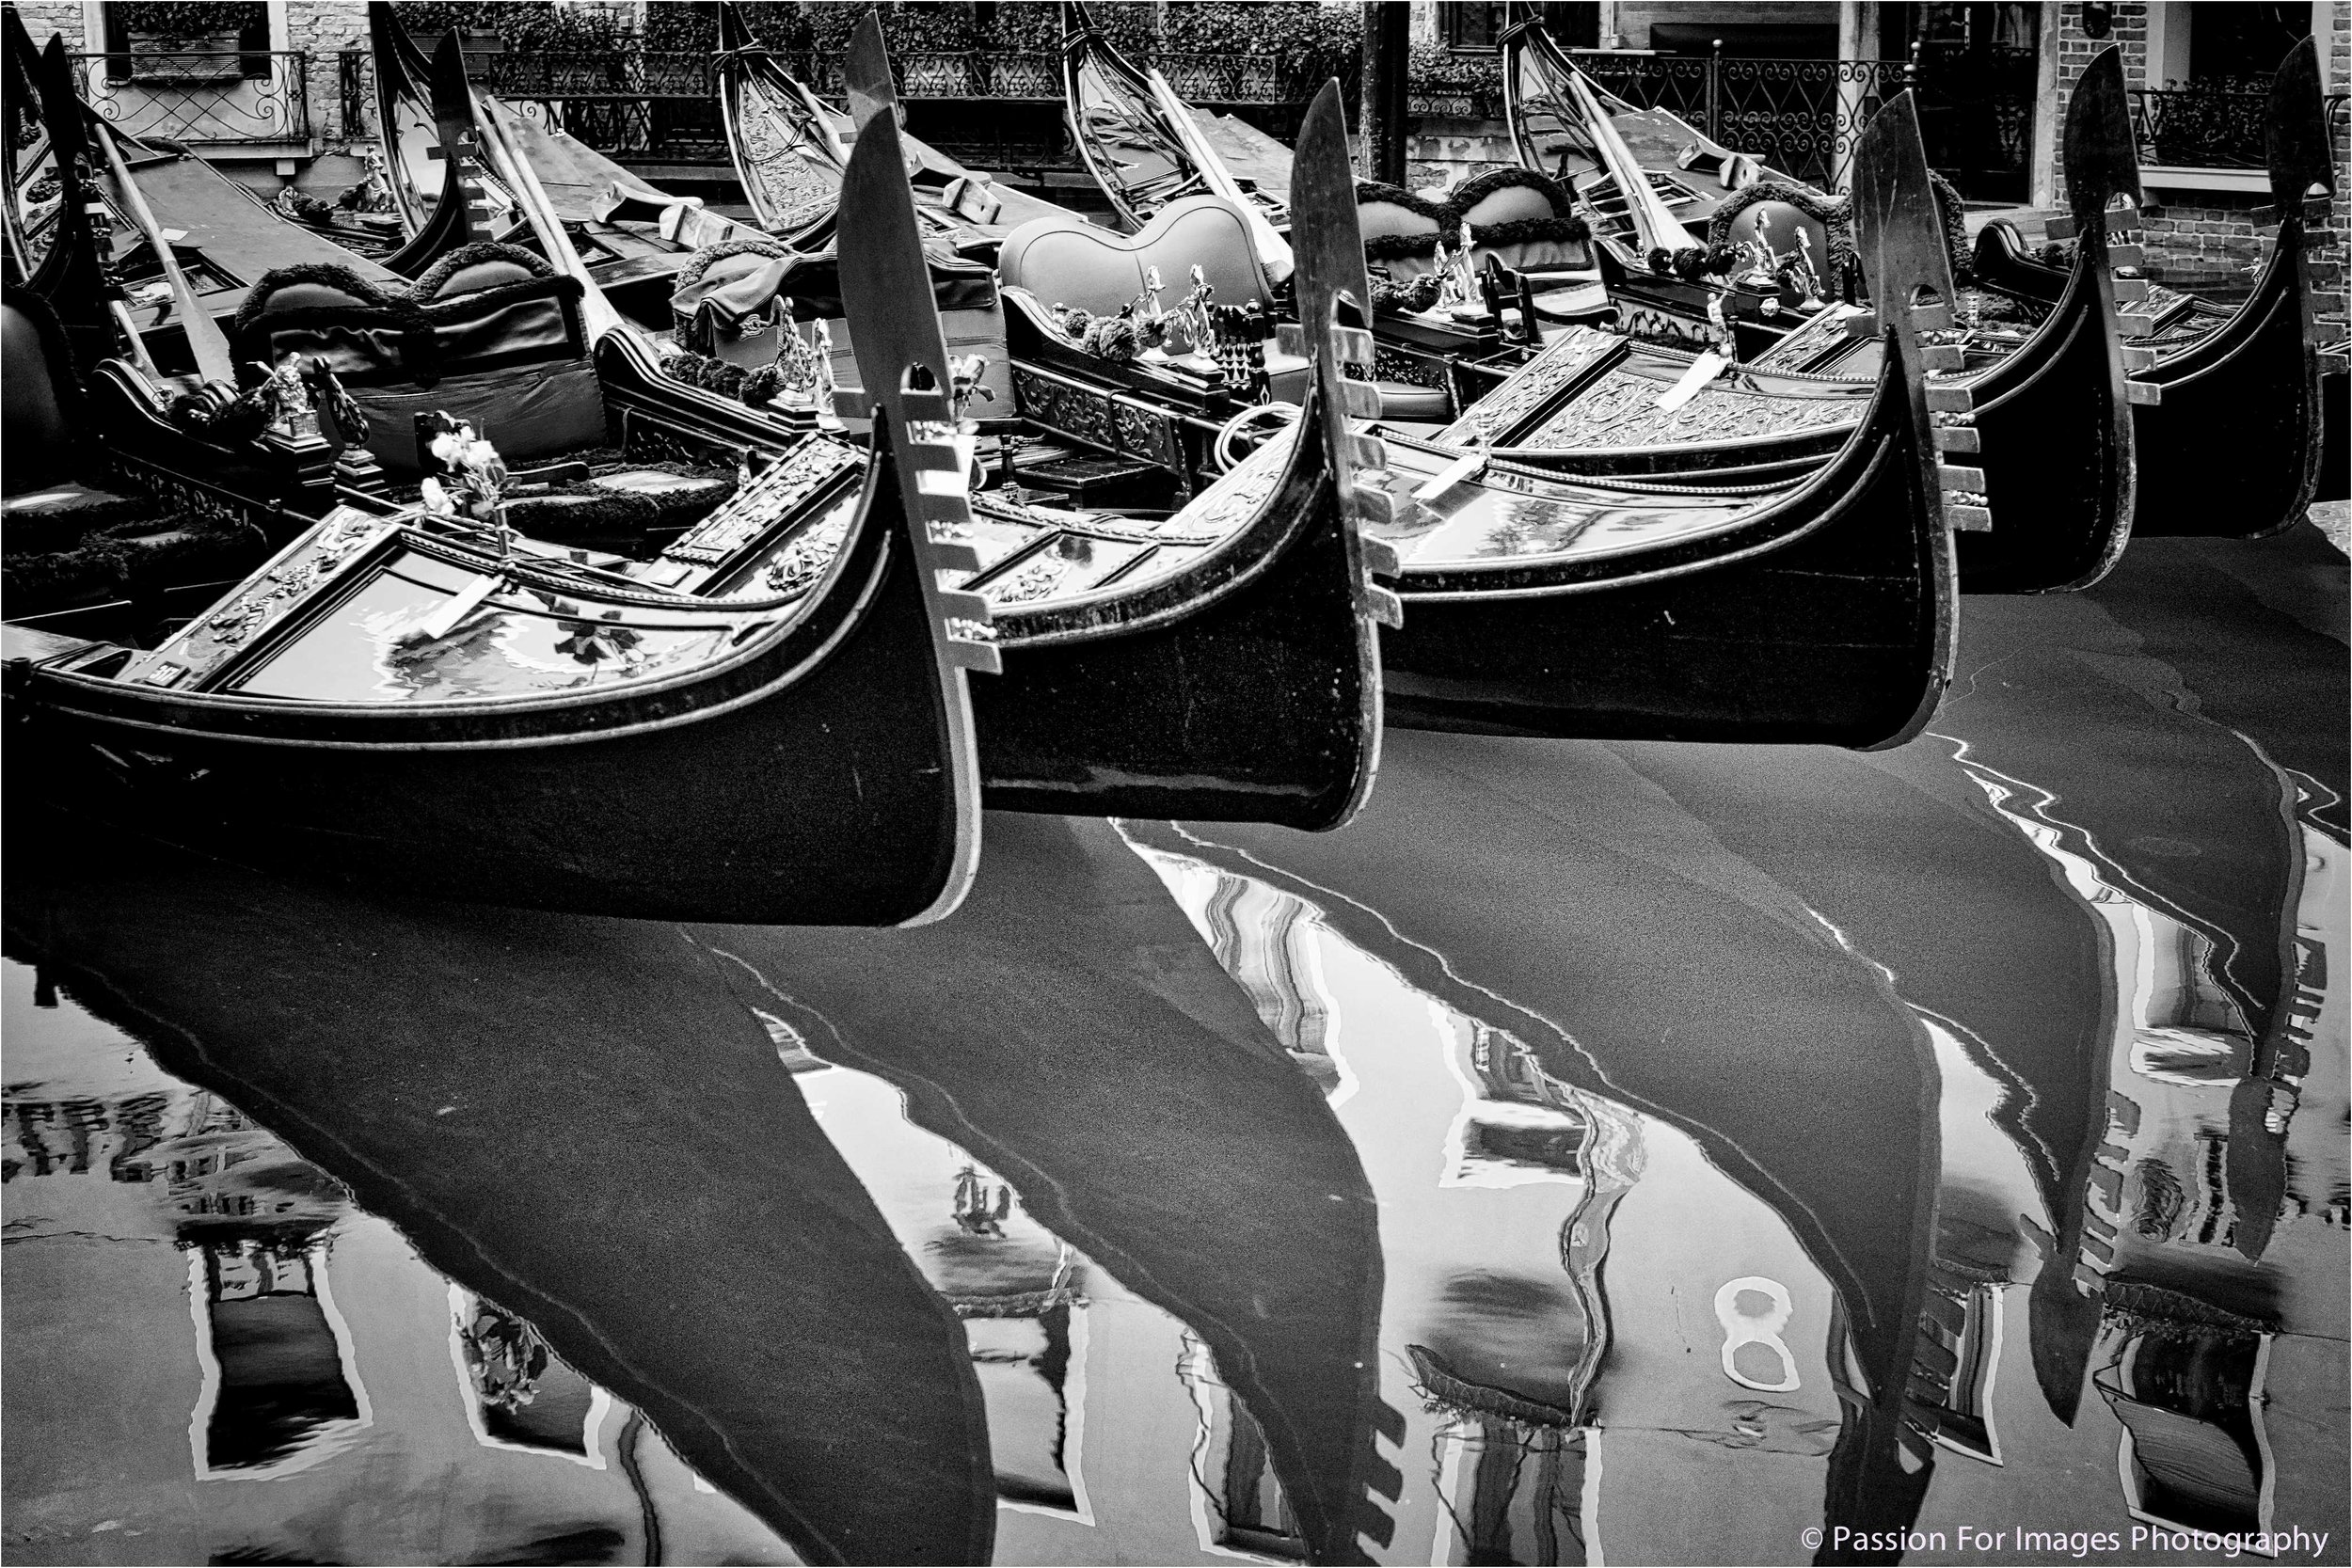 DSCF1668_2016_01_Venice-Edit-2.jpg